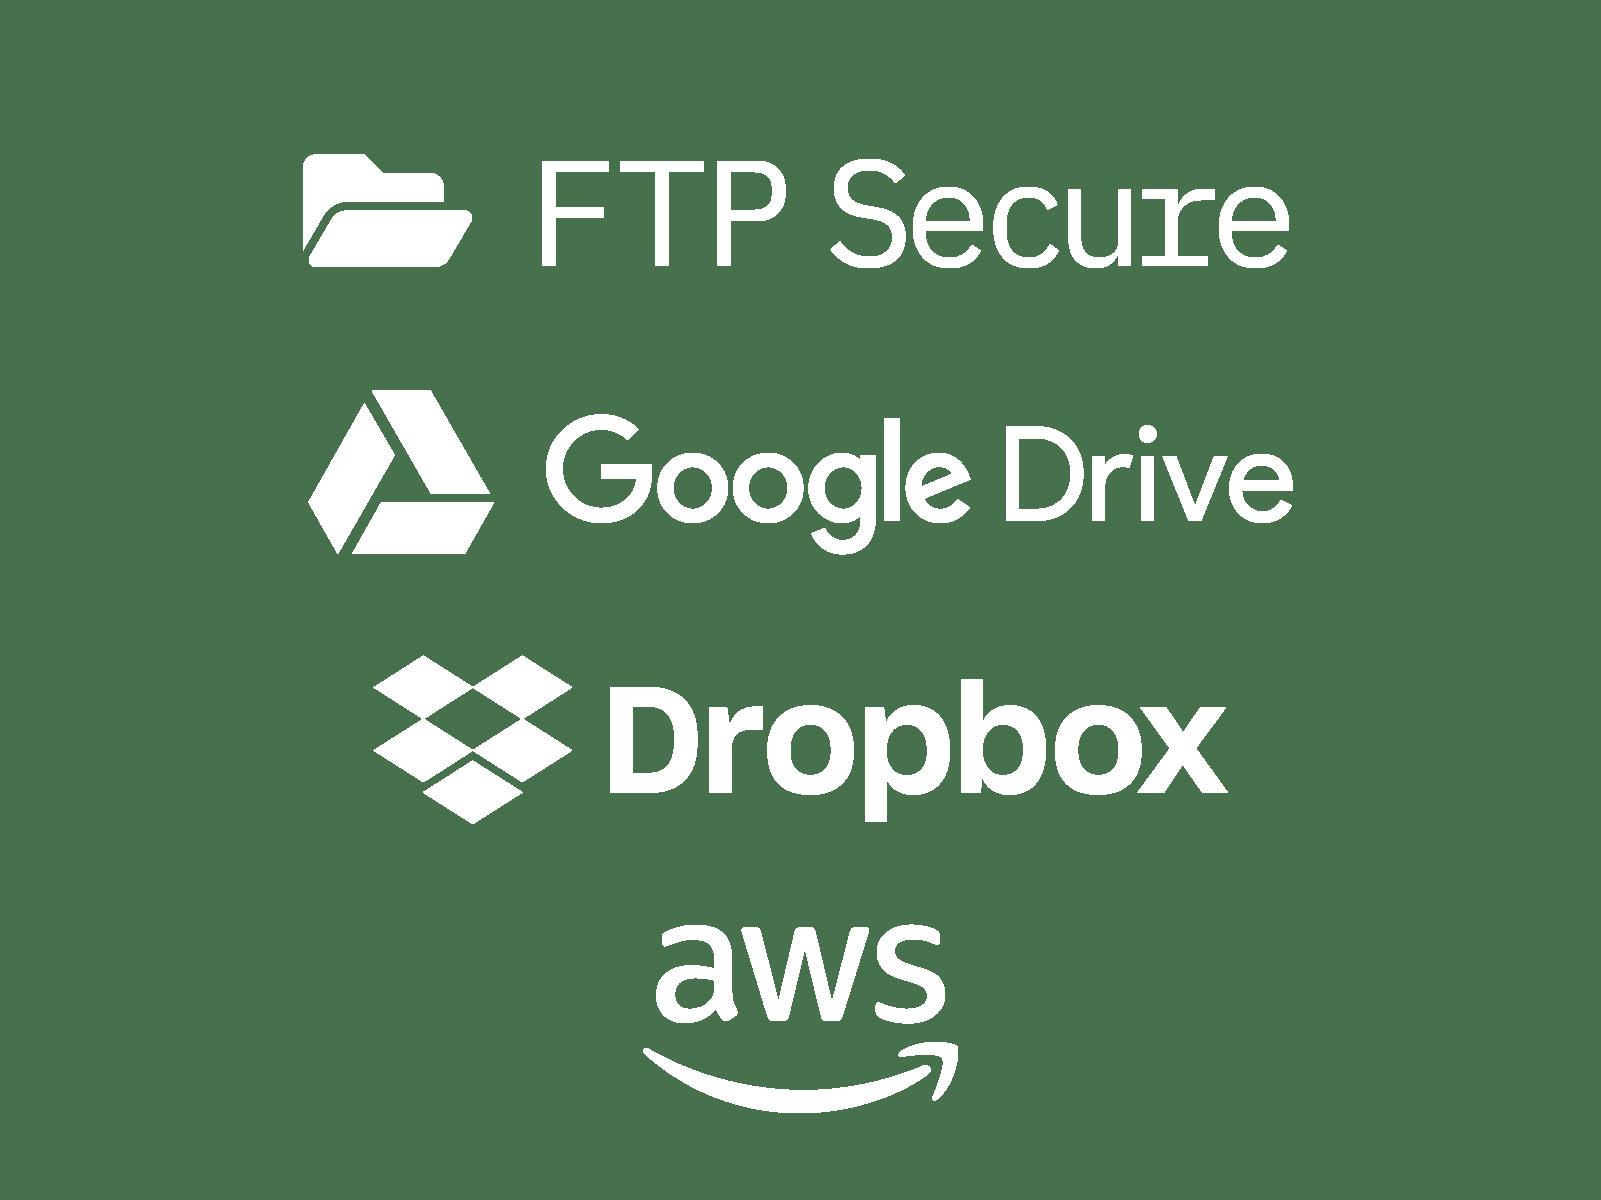 Word art of popular cloud storage providers; Dropbox, Google Drive, etc